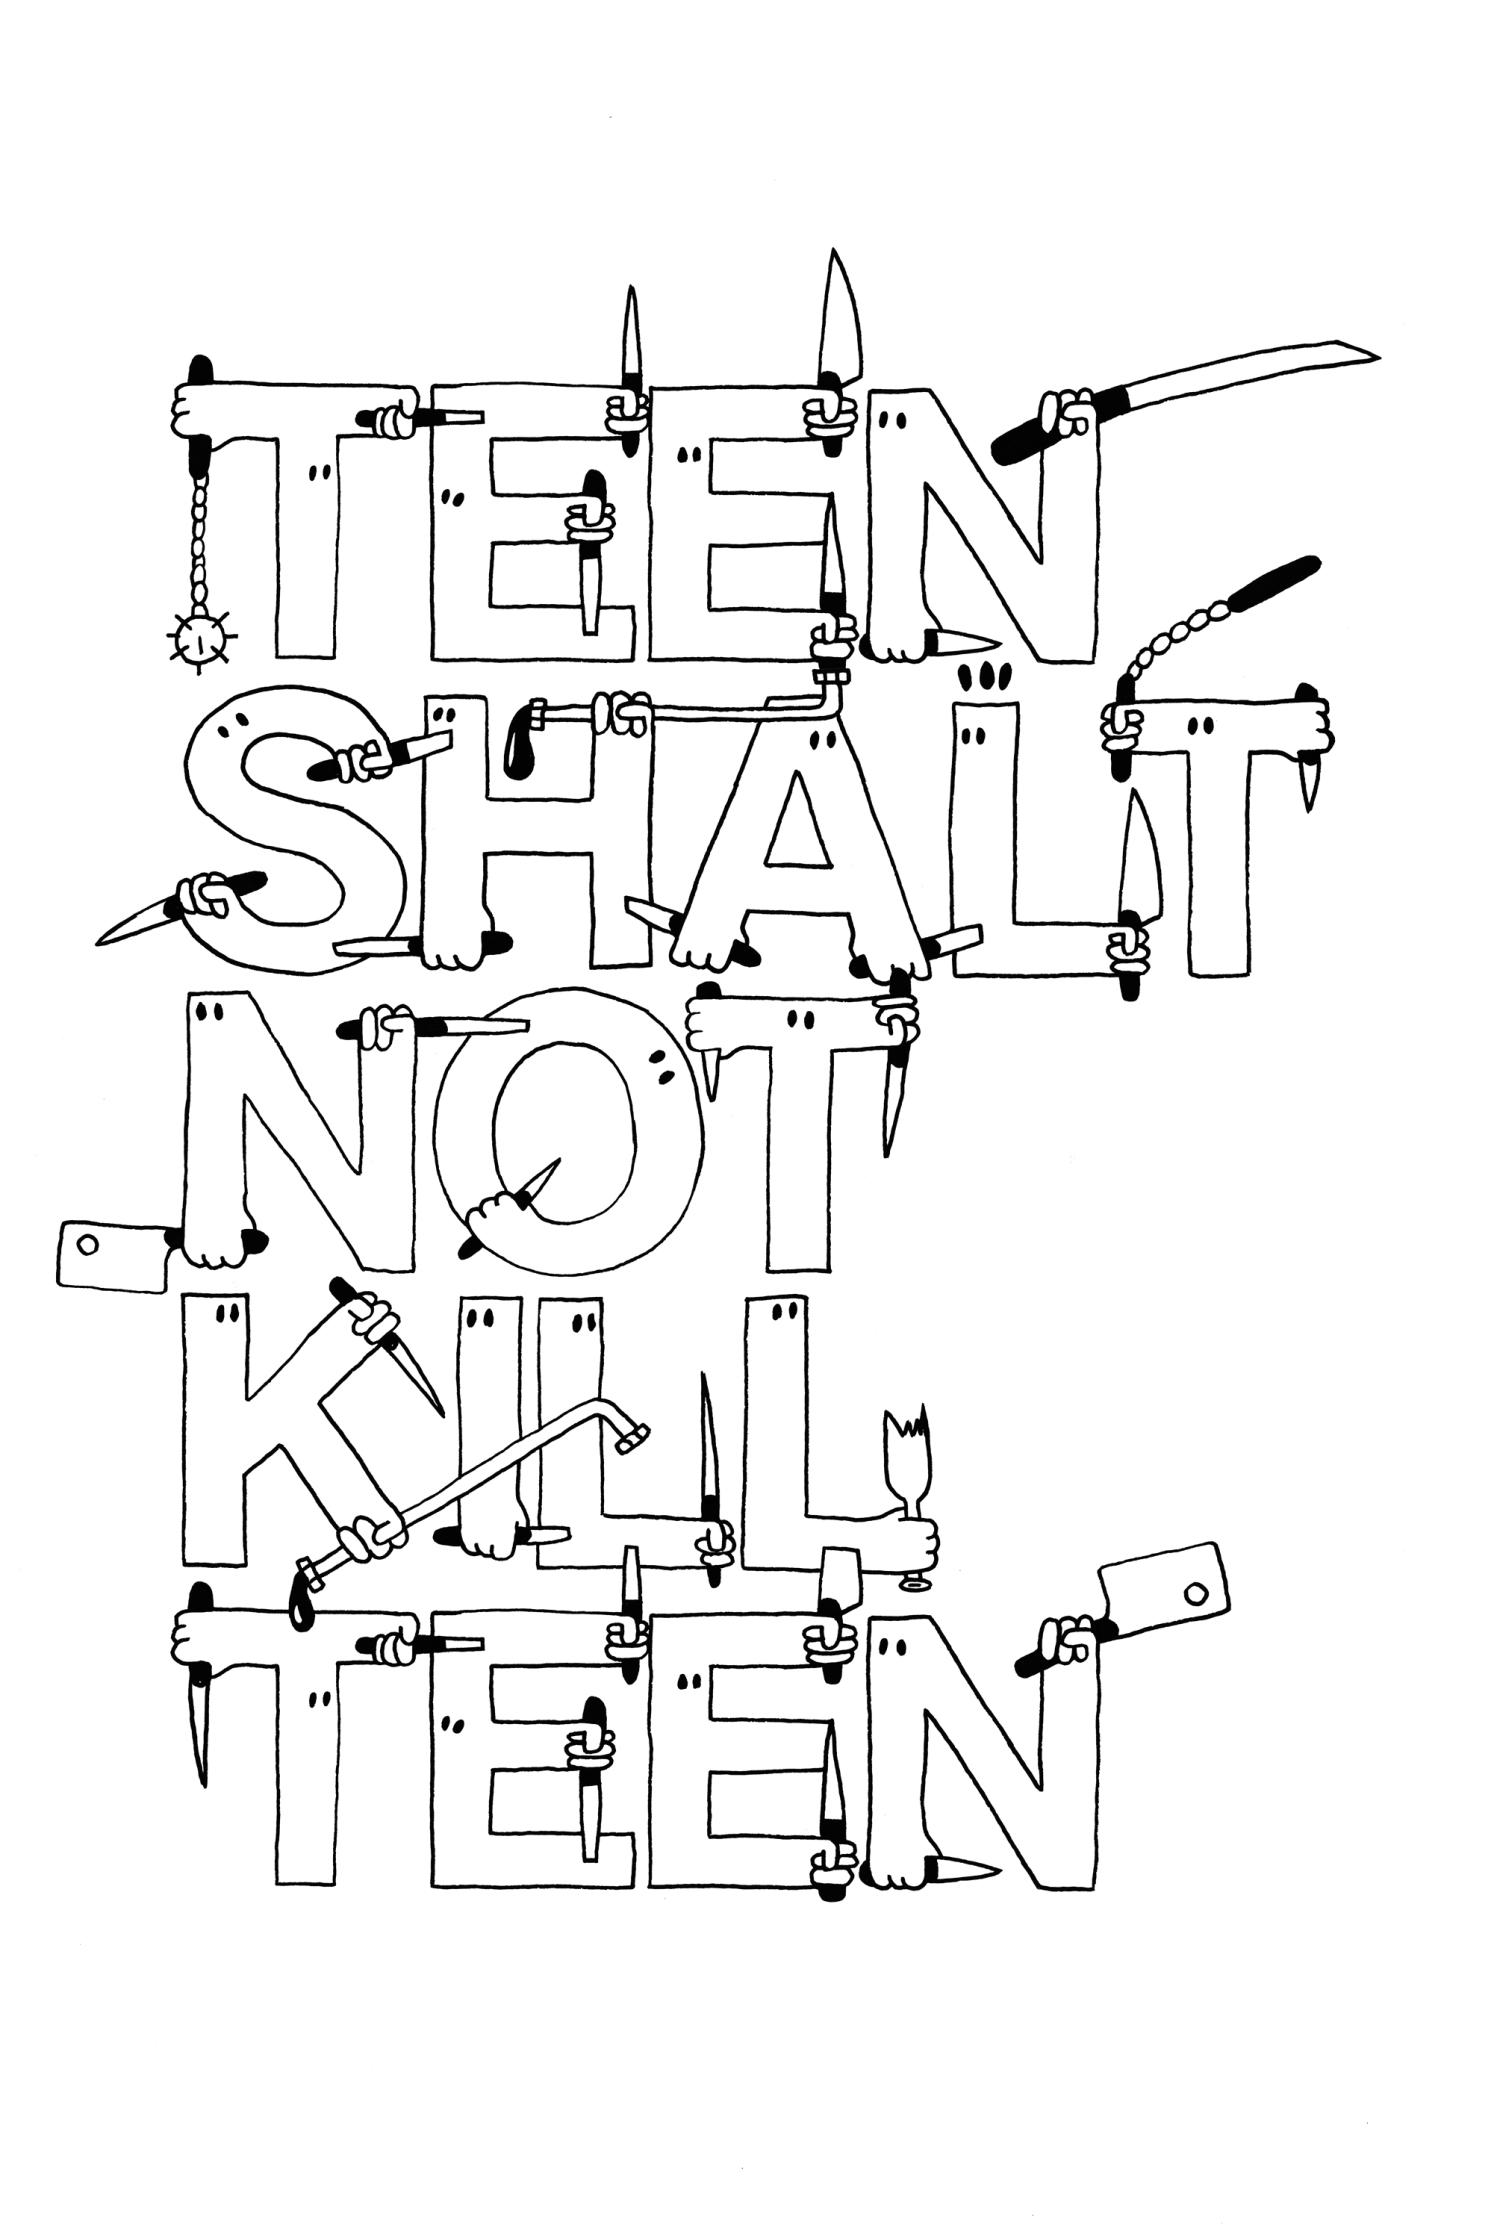 Teen Shalt Not Kill Teen